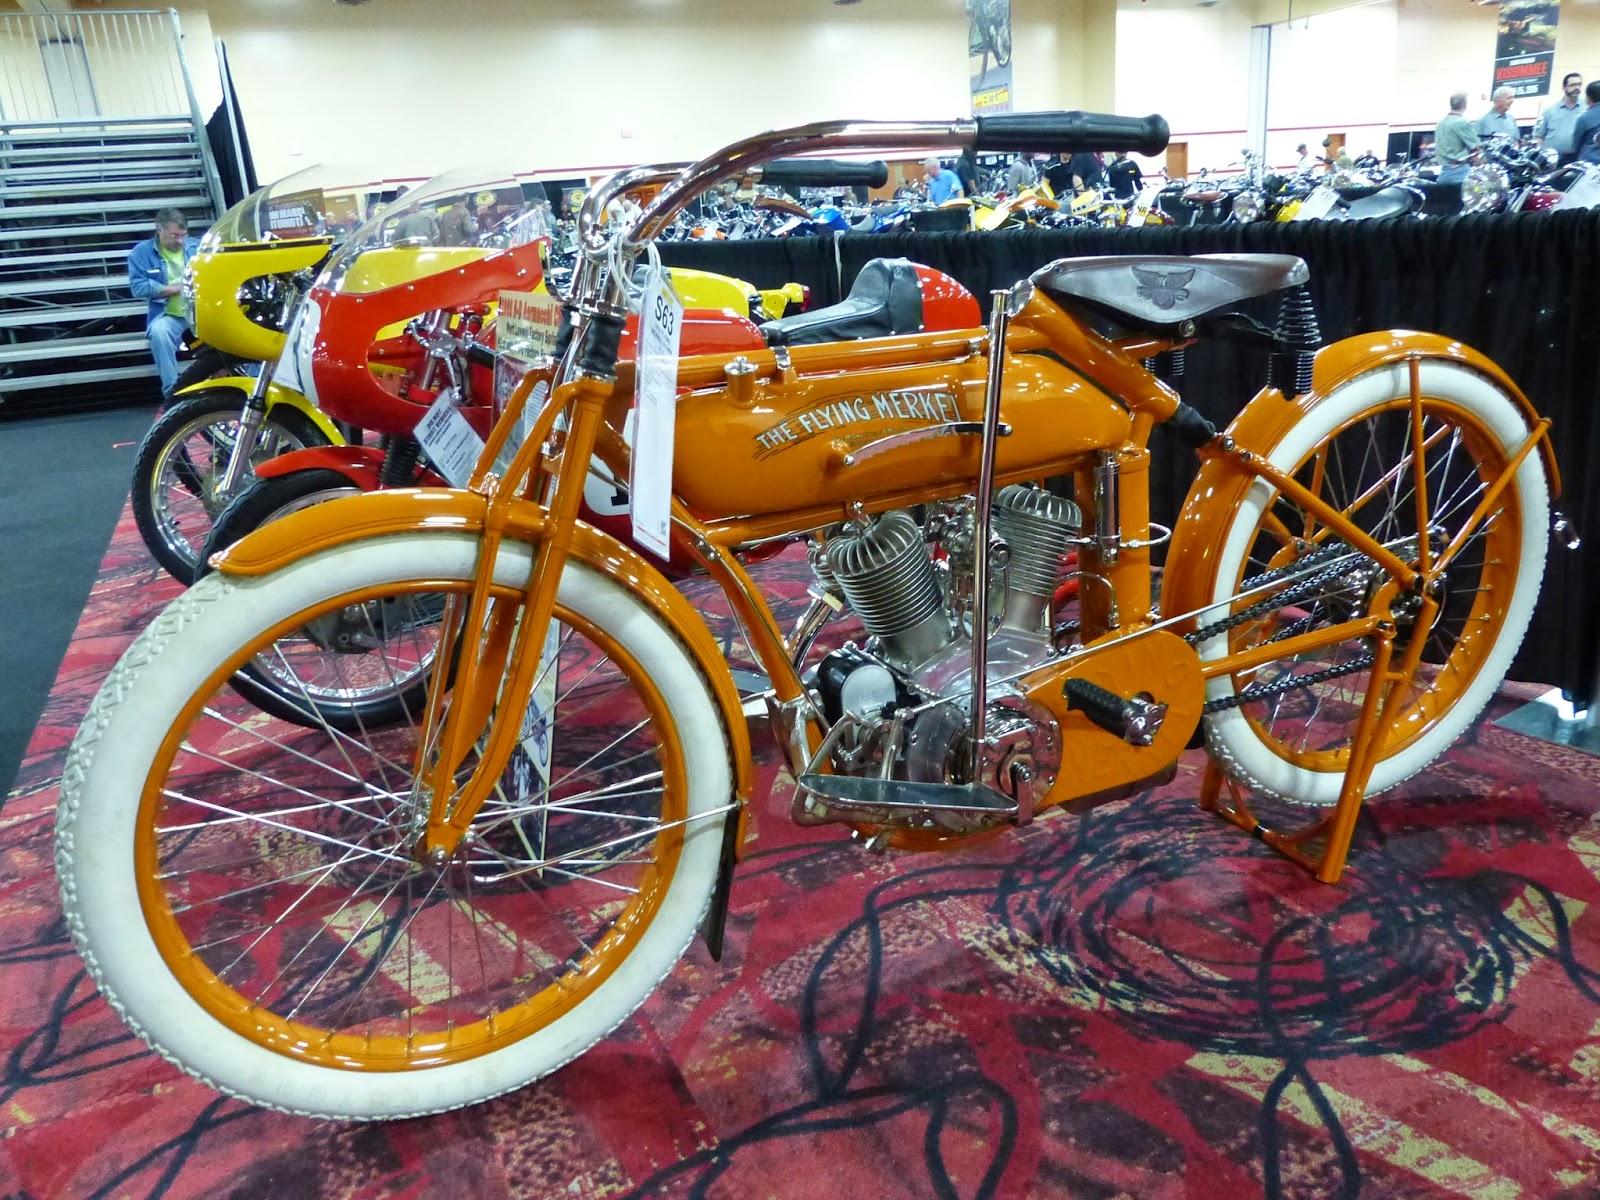 1915 Flying Merkel for sale at the 2015 Mecum Las Vegas Motorcycle Auction f85904b79